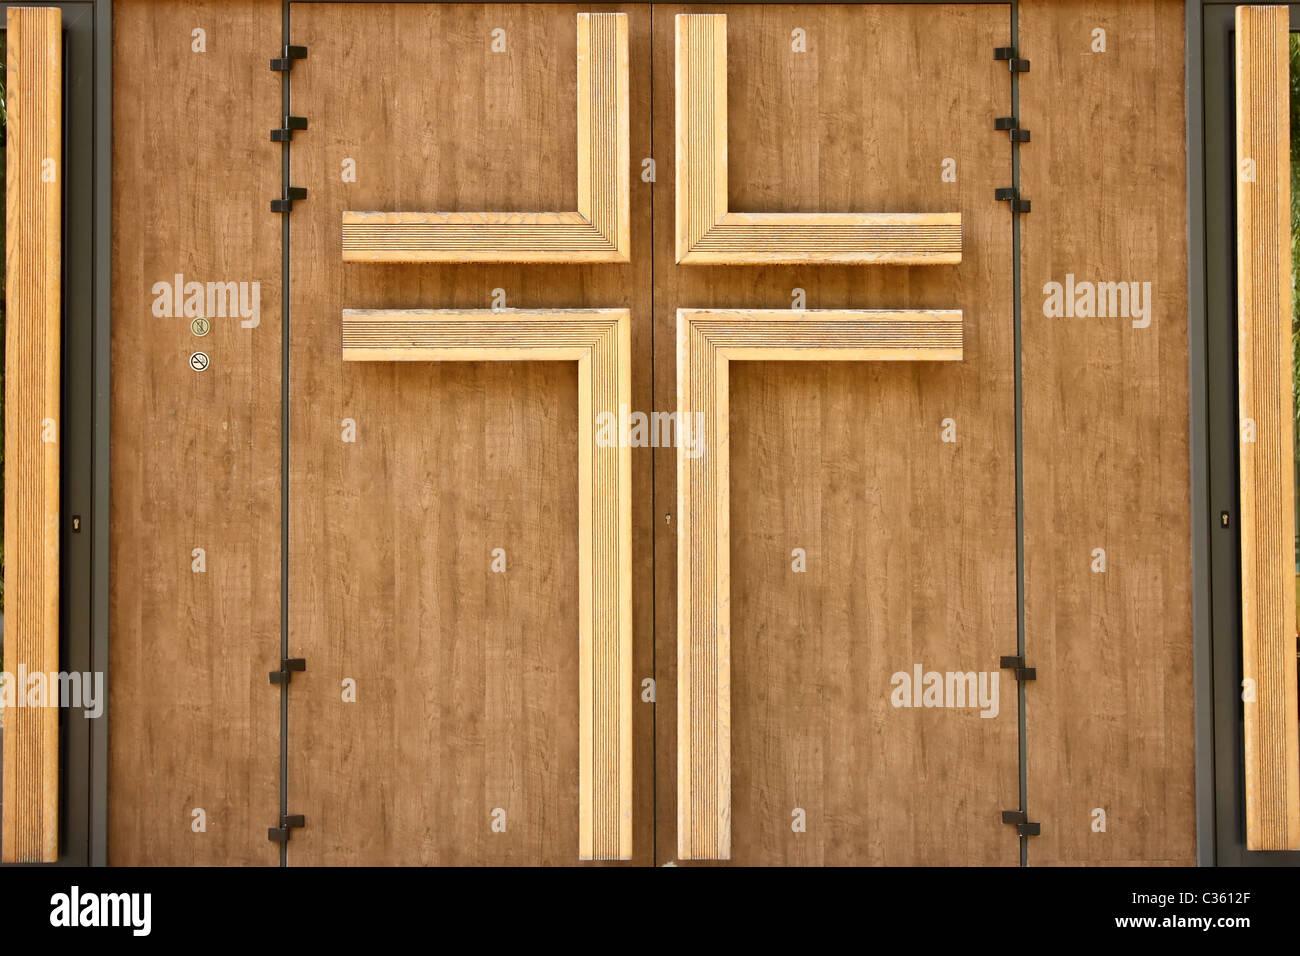 Wooden Crucifix At Church Stock Photos Wooden Crucifix At Church